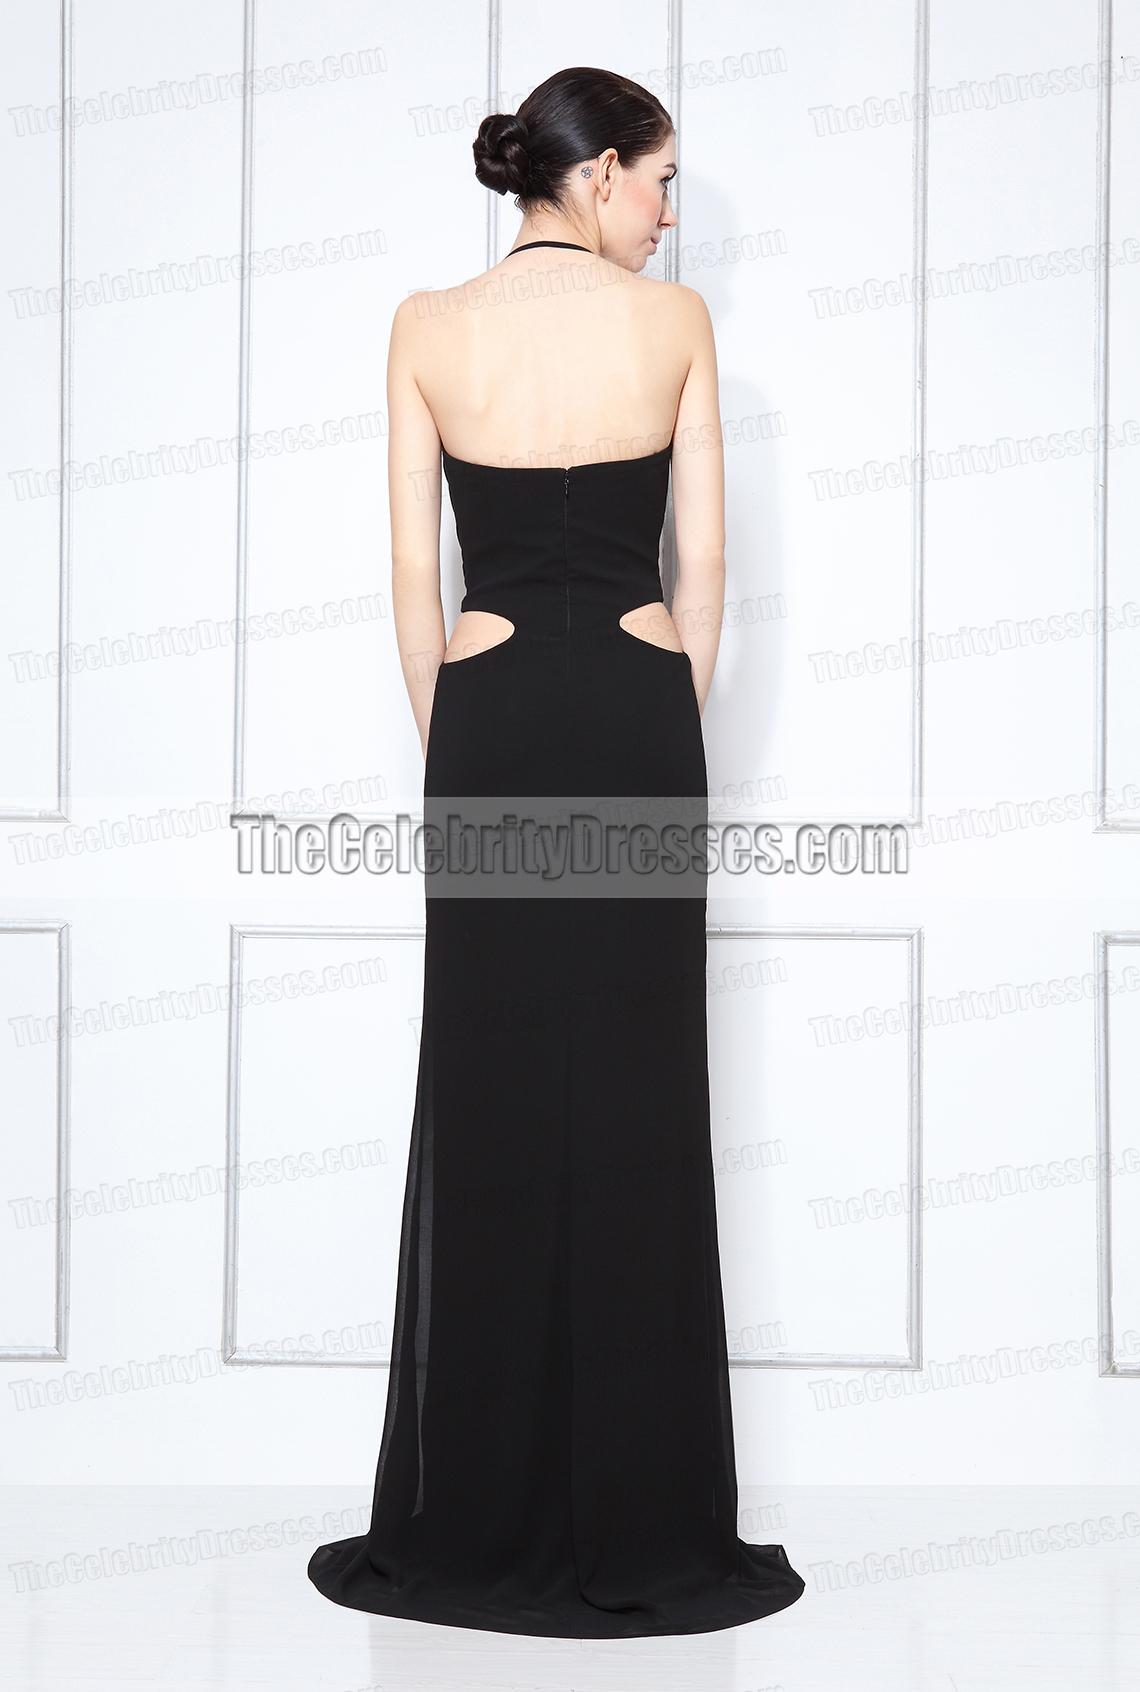 Selena Gomez Schwarz Ausschnitt Prom Dress 2011 Billboard Music ...